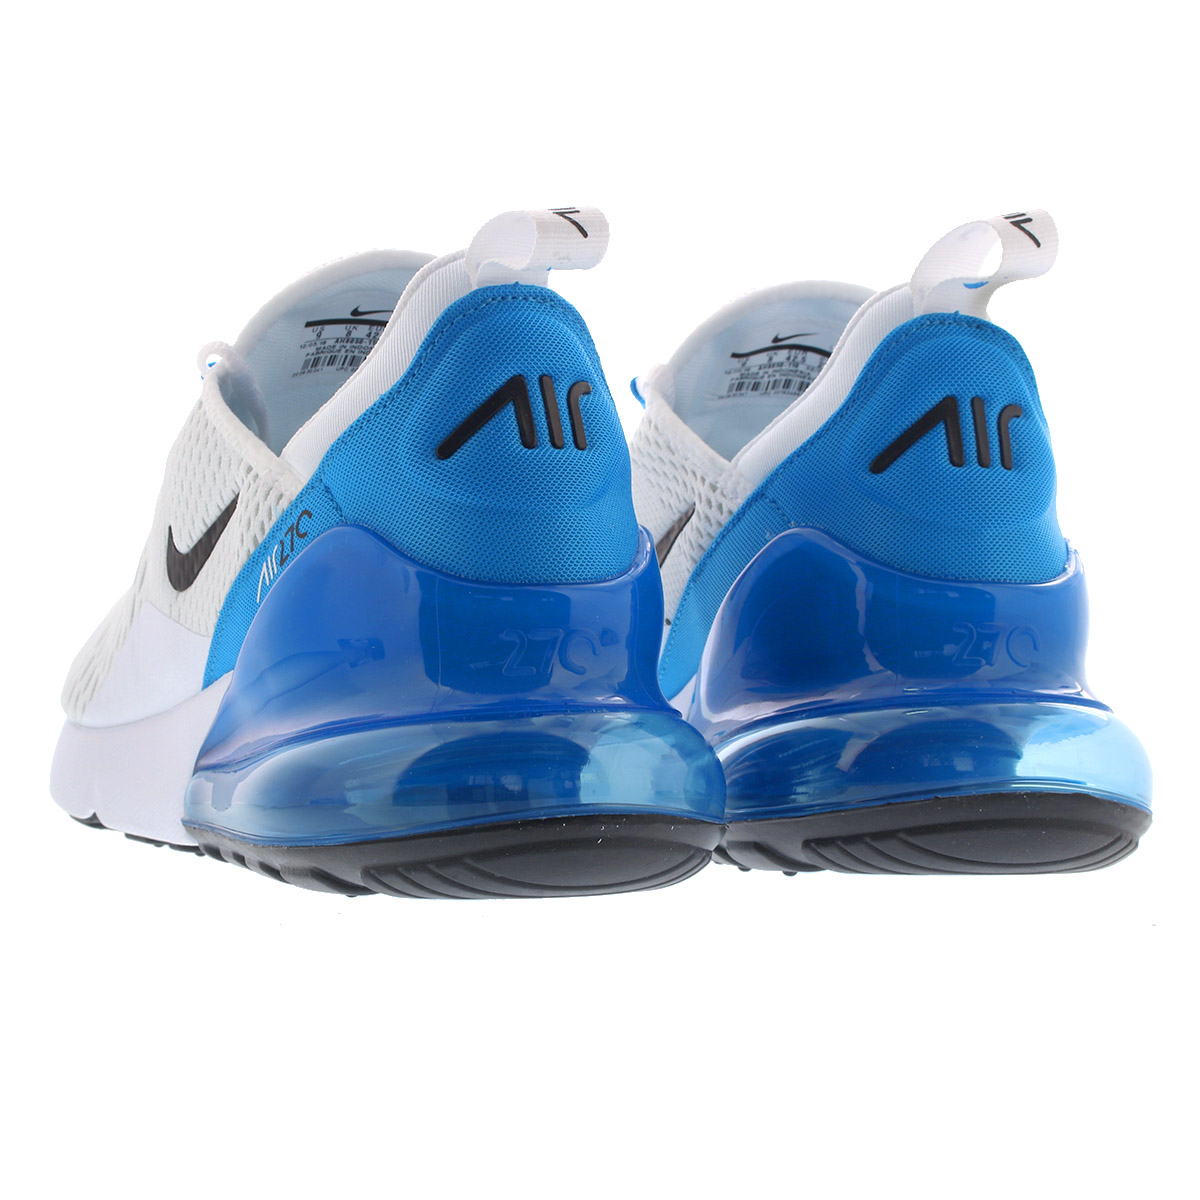 Buy Nike Air Max 270 WhiteBlack Photo Blue Pure Platinum AH8050 110